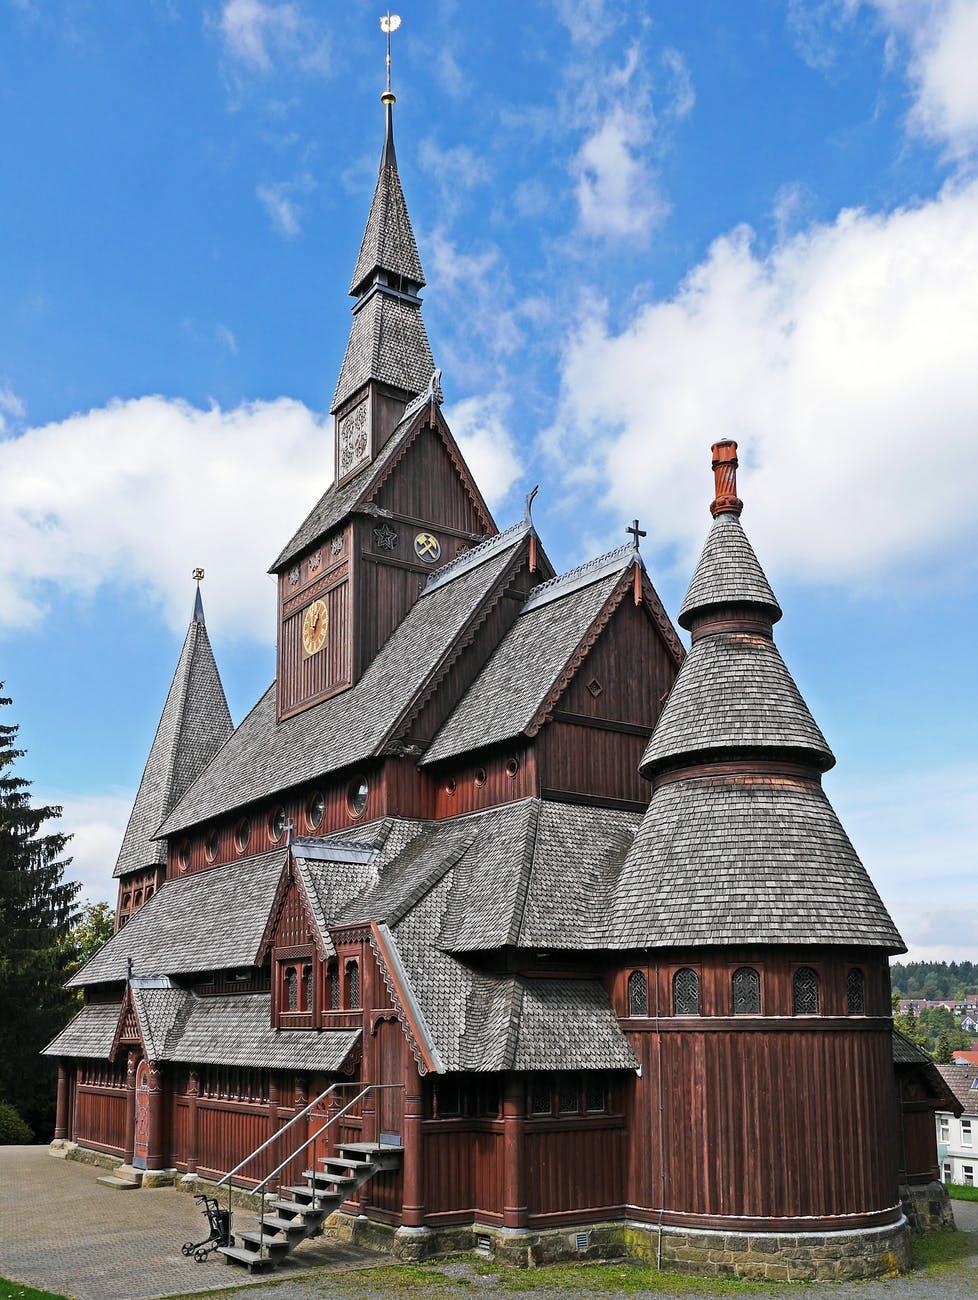 ancient architecture building church